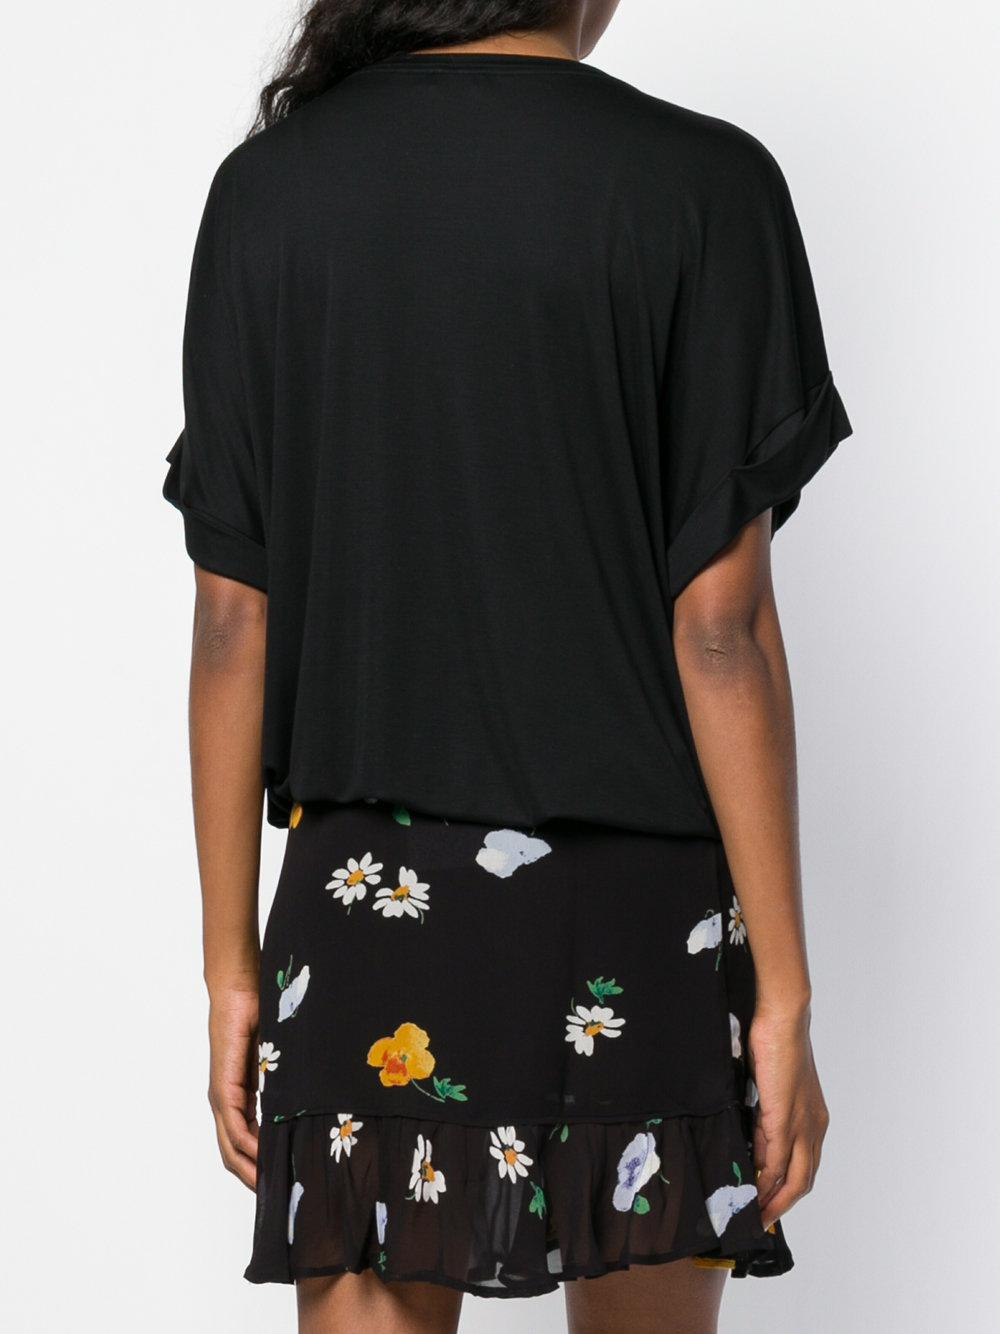 waist-tied shift T-shirt - Black Closed Buy Cheap Best Wholesale Largest Supplier Shopping Online Cheap Online DwbVM